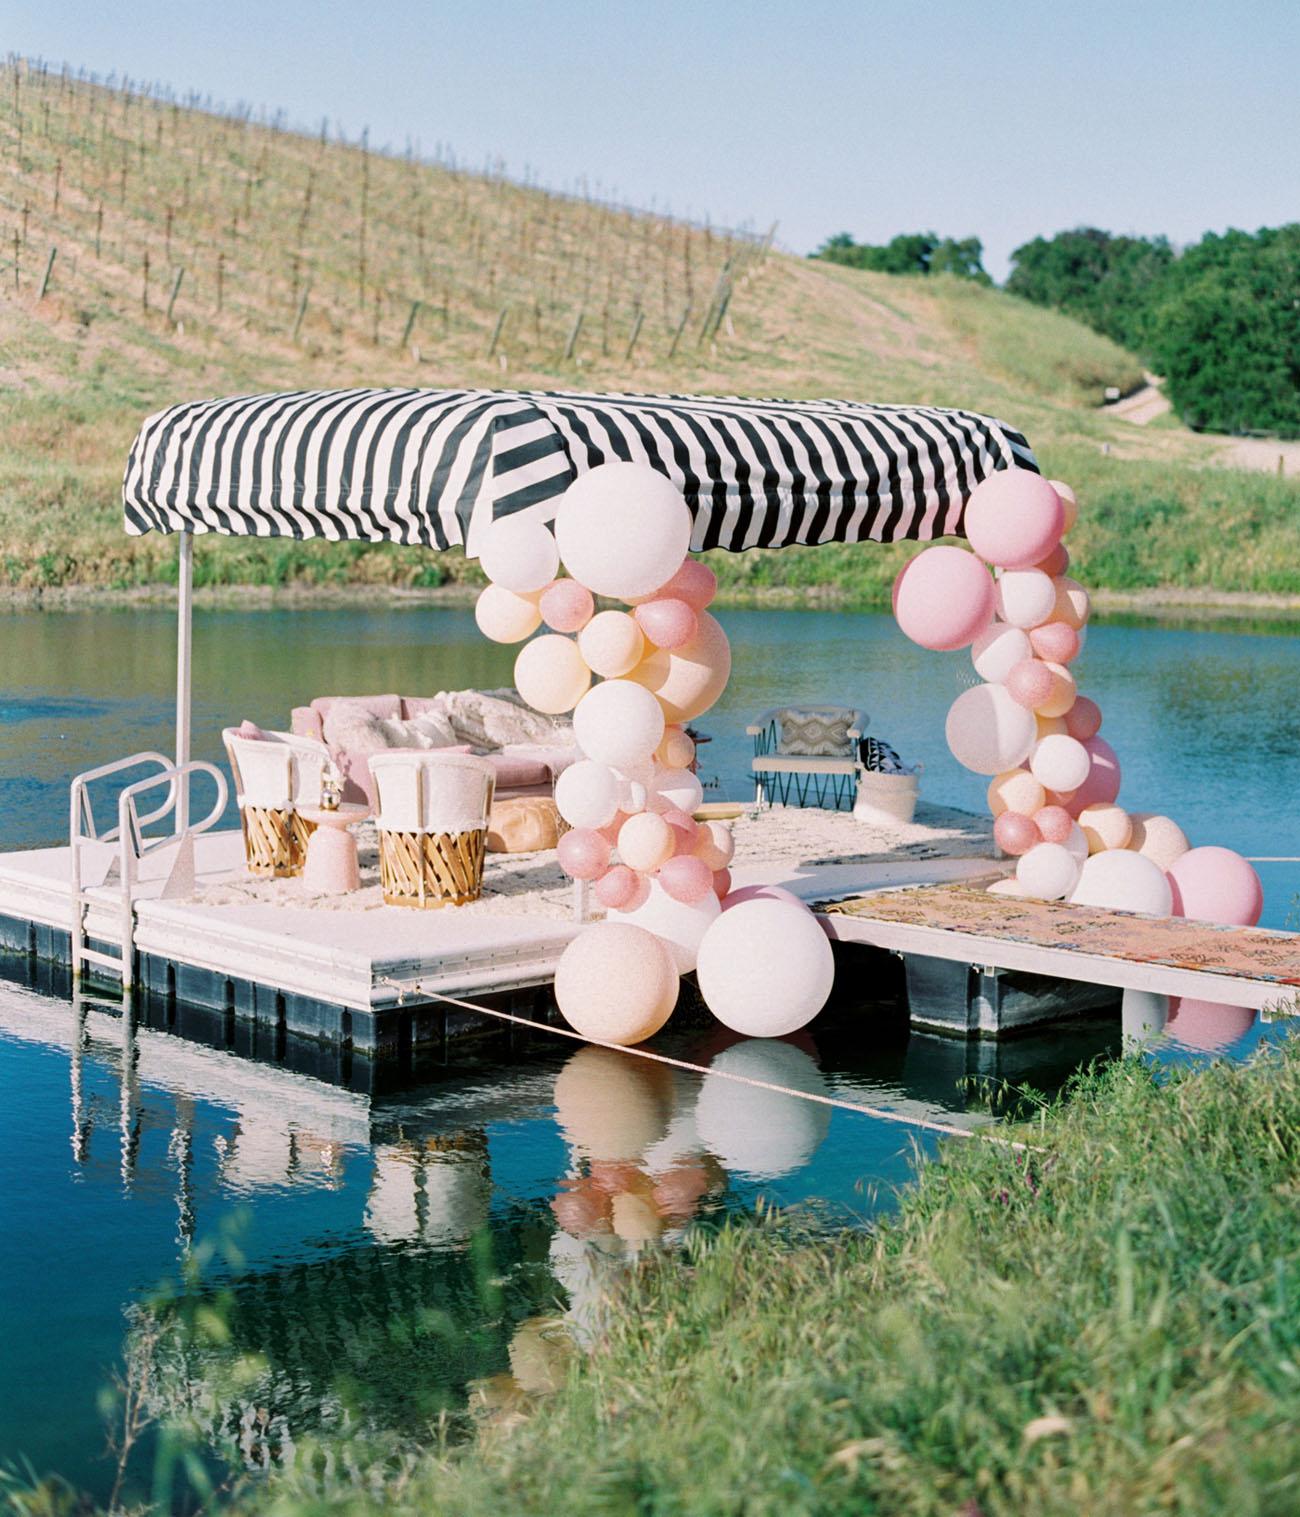 bachelorettecampfest-styled-06.jpg